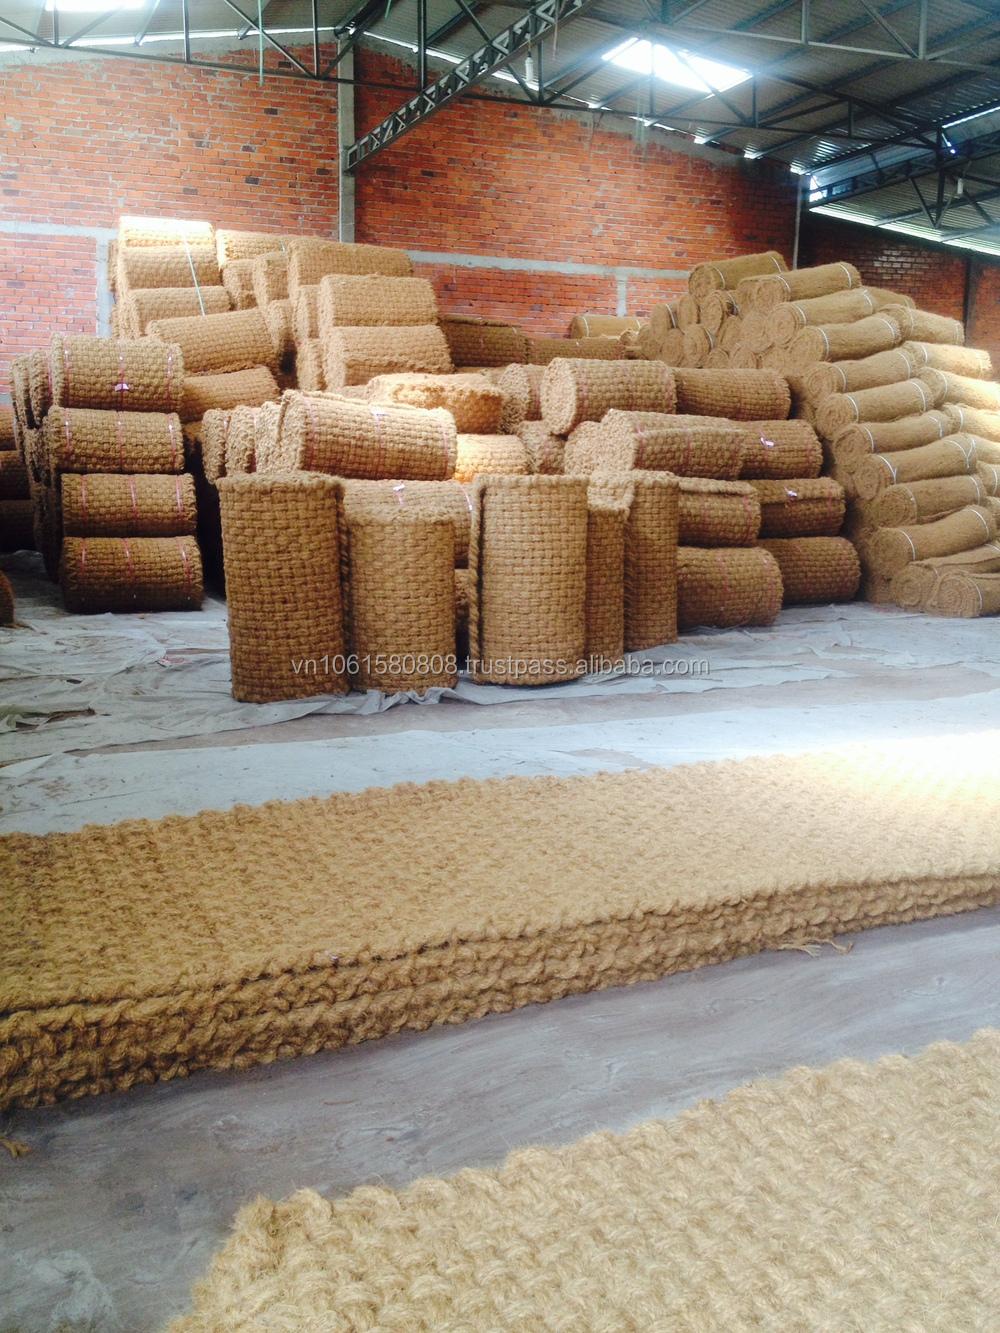 coir rope coconut fiber rope best price buy coir rope coir rope manufacturer coconut fiber. Black Bedroom Furniture Sets. Home Design Ideas